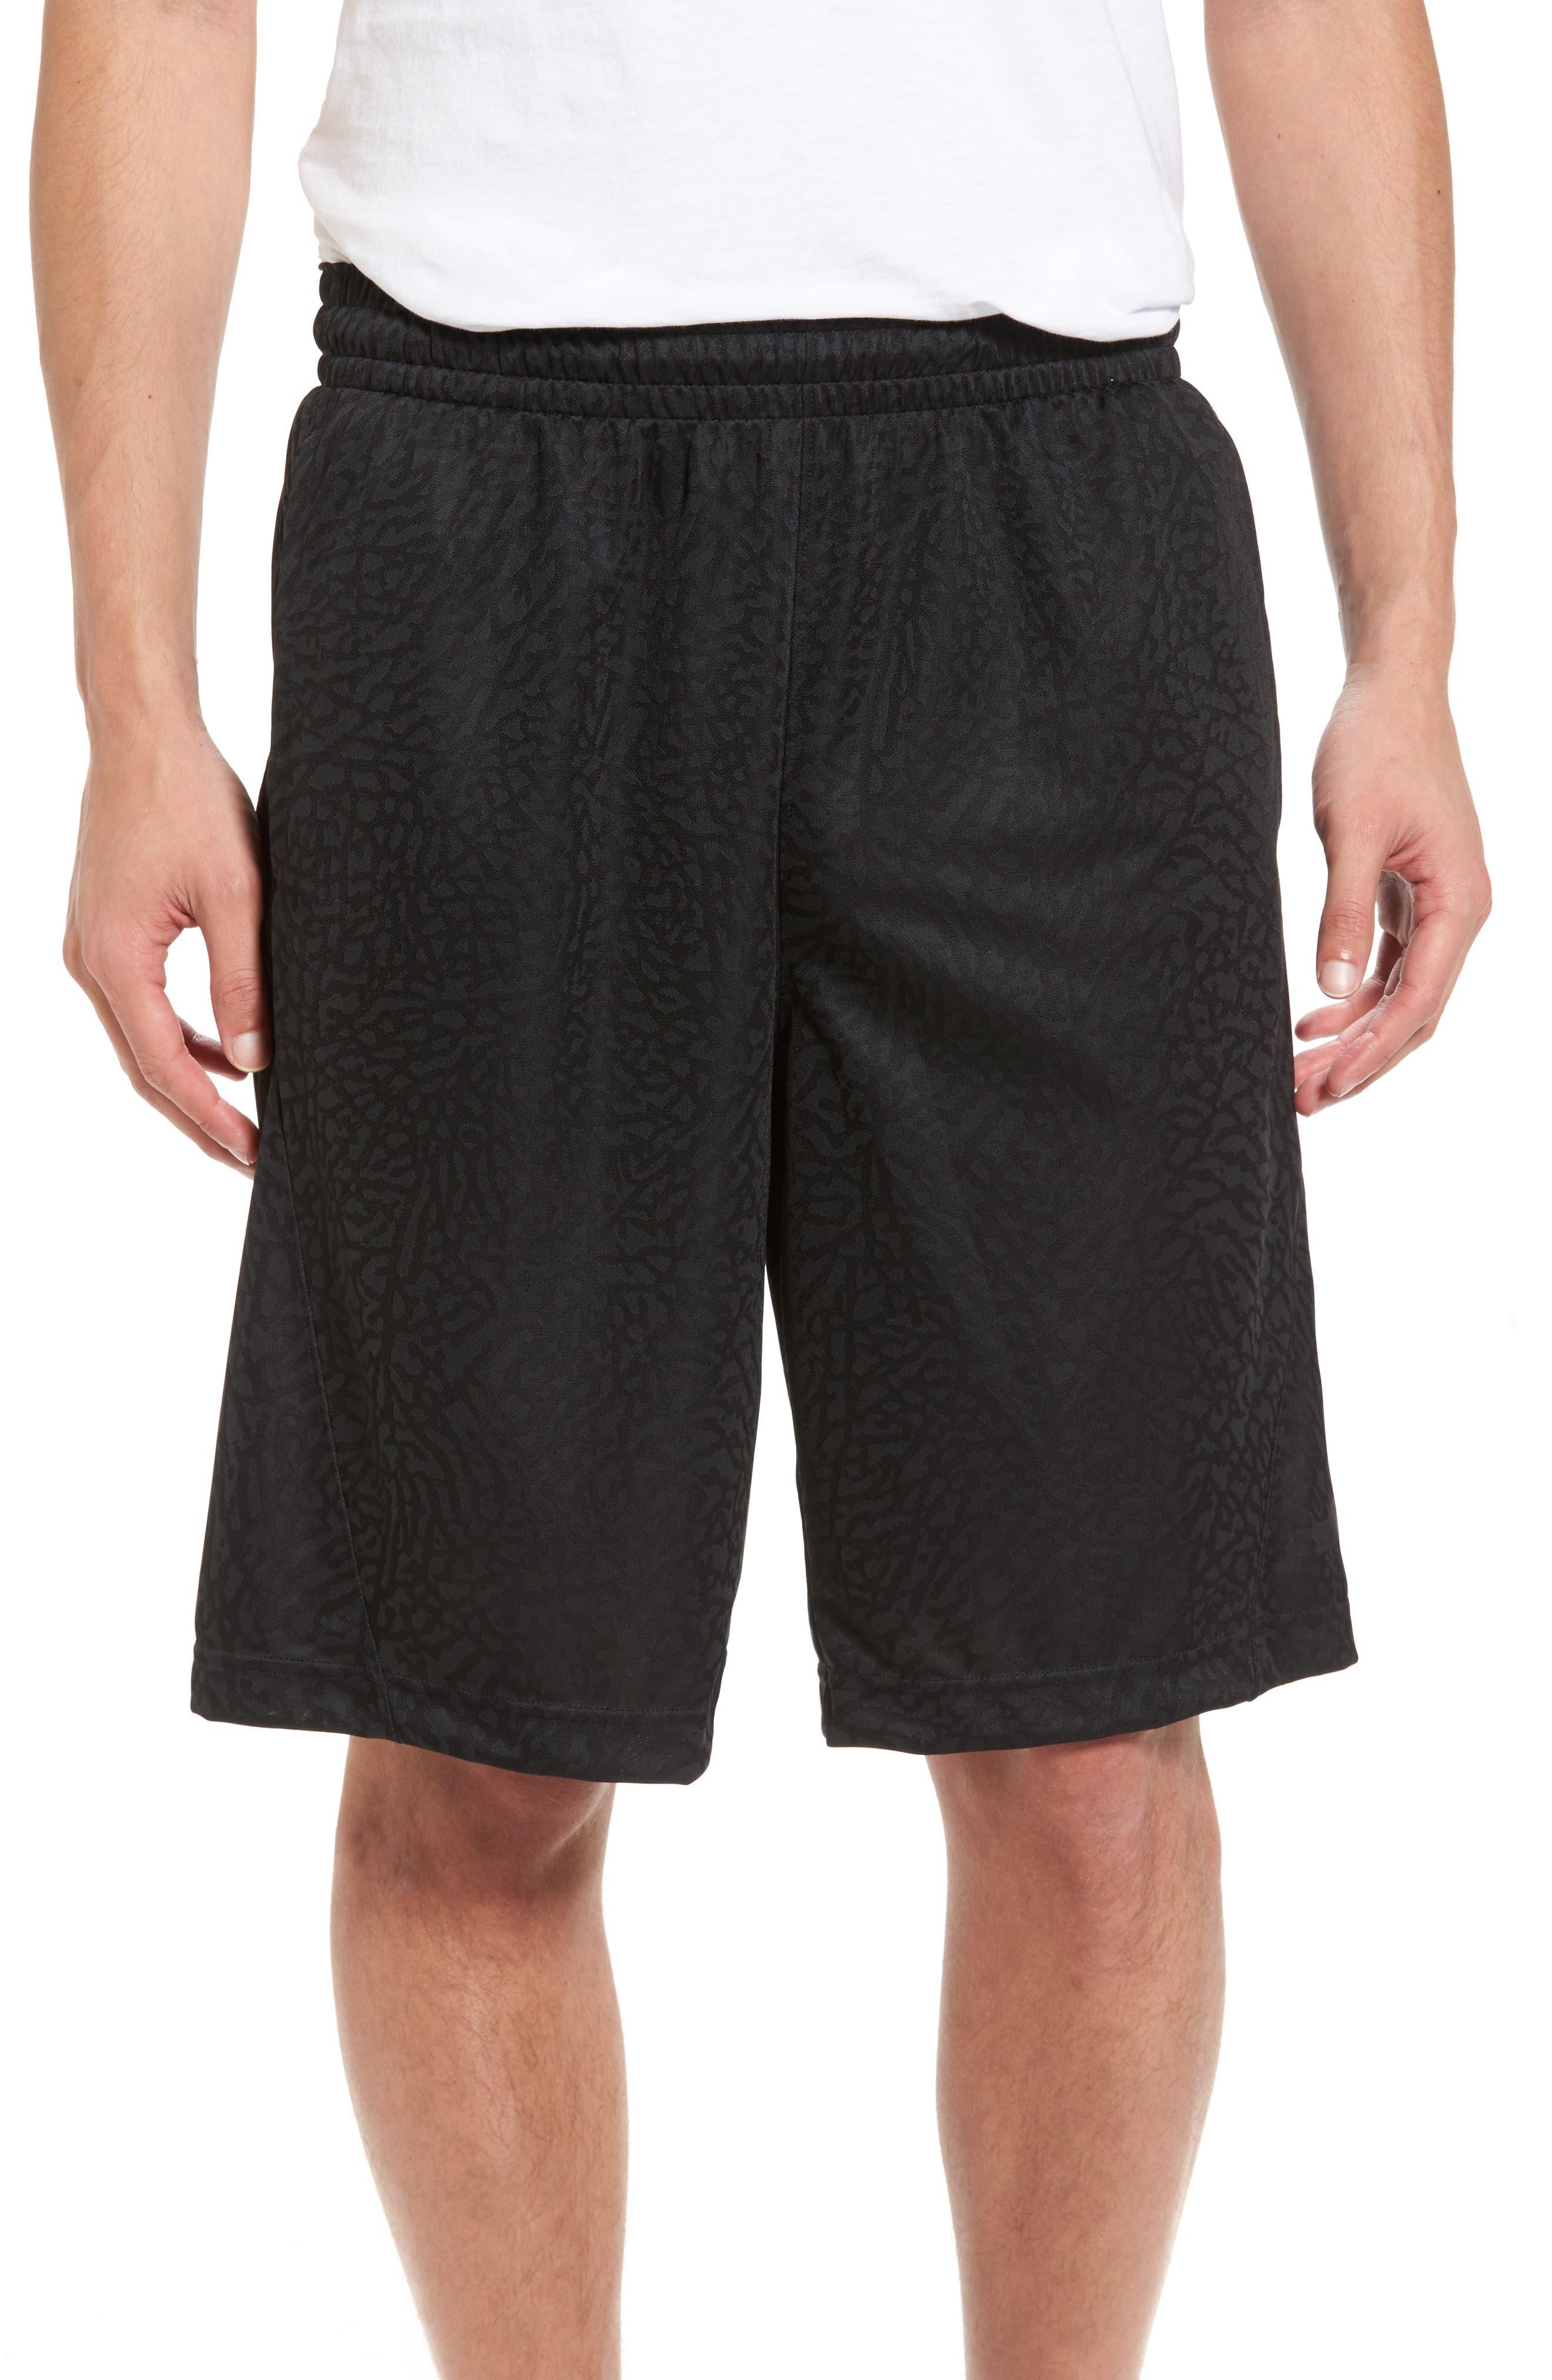 Rise Vertical Basketball Shorts,                         Main,                         color, 010